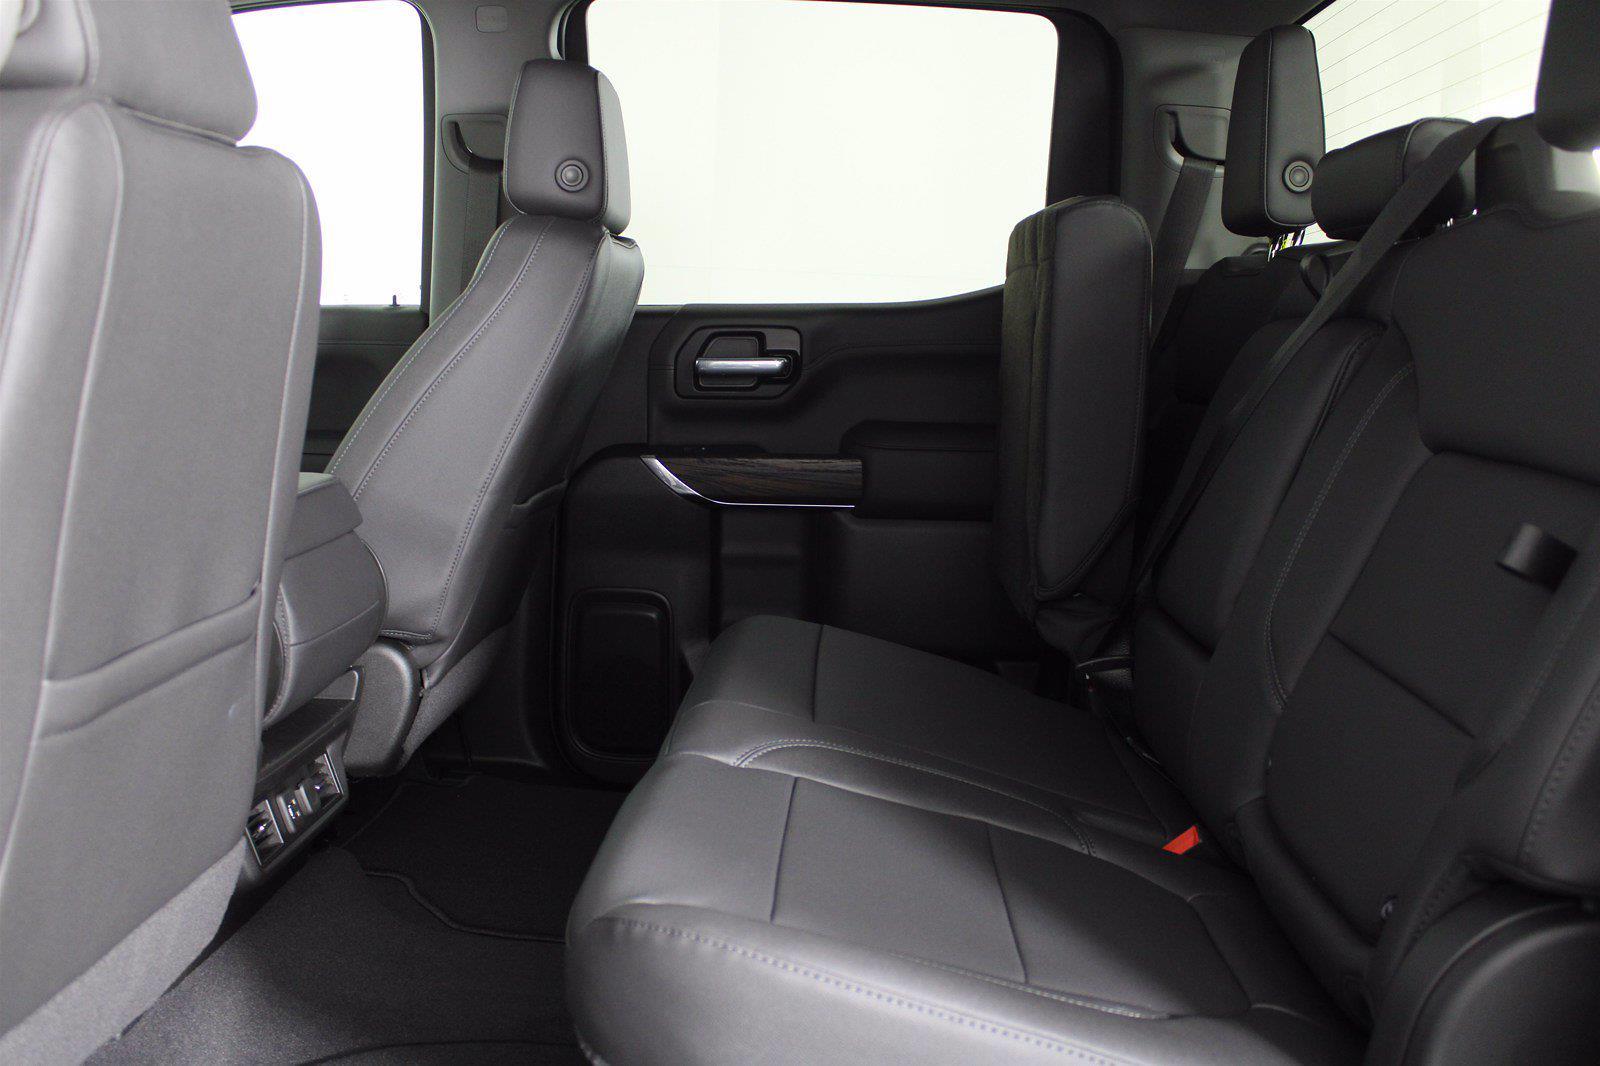 2021 GMC Sierra 1500 Crew Cab 4x4, Pickup #D410588 - photo 15